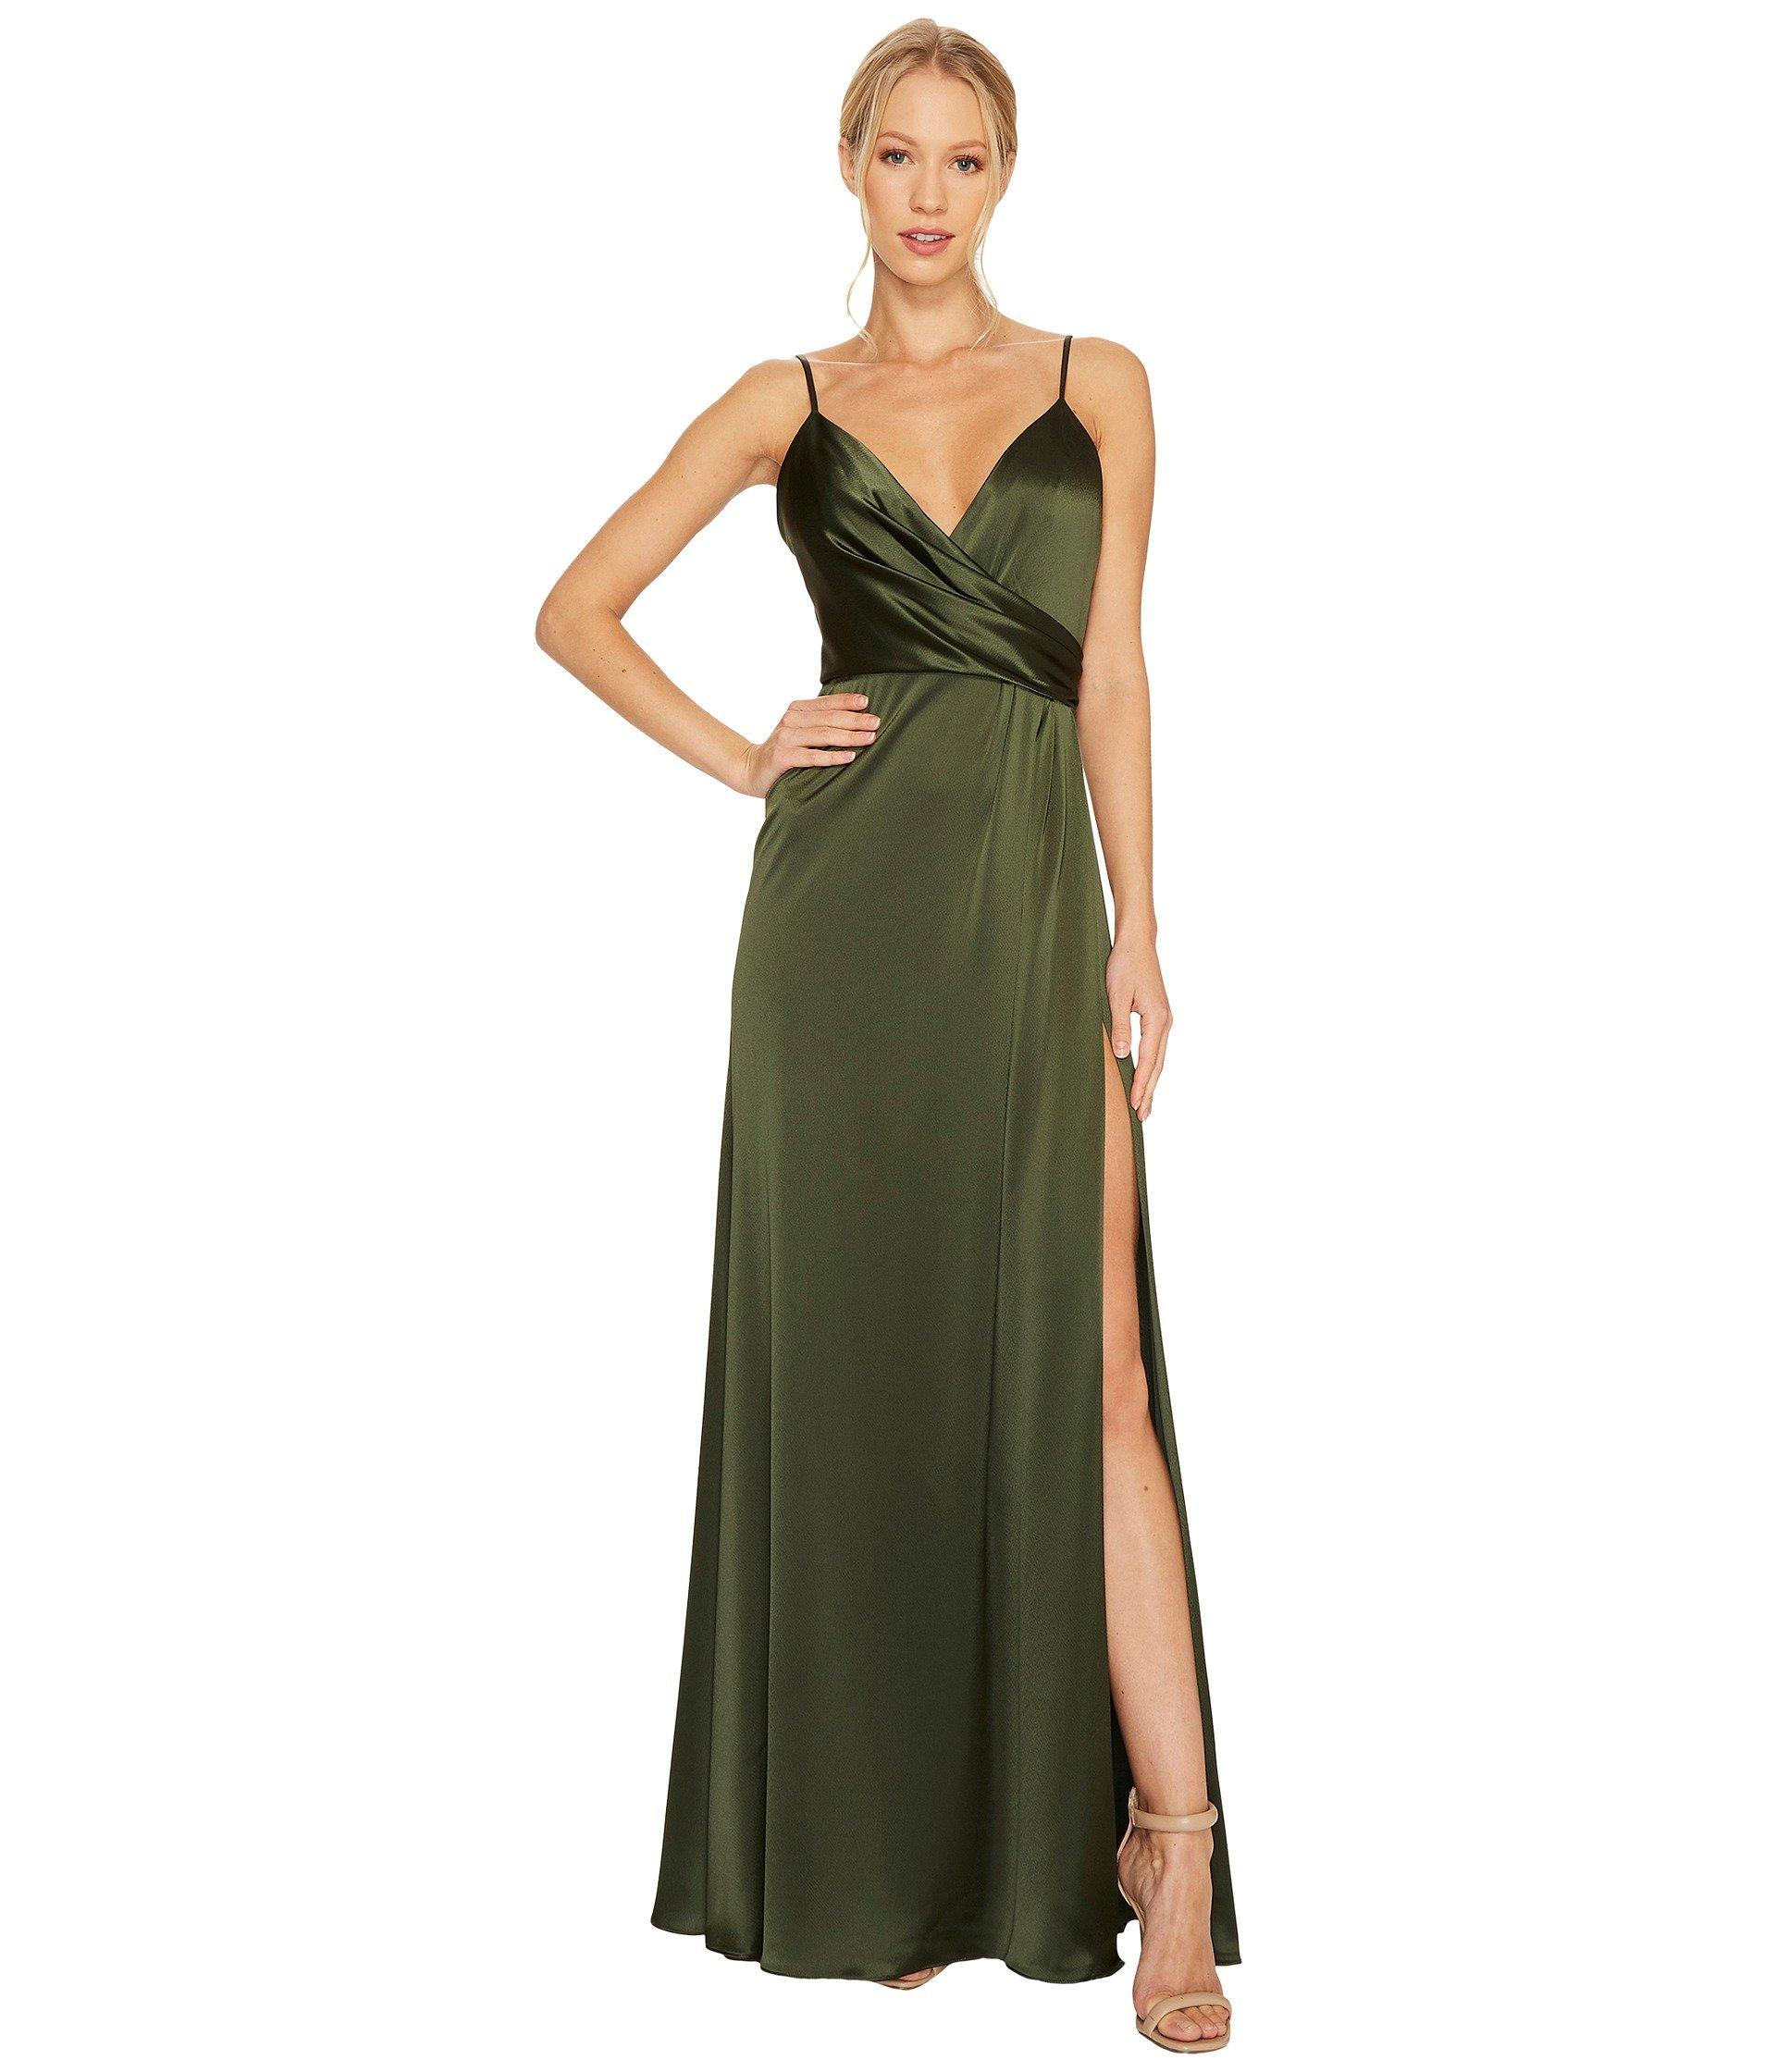 697f2434ac194 Jill Jill Stuart Satin Back Crepe Slip Dress In Olive | ModeSens